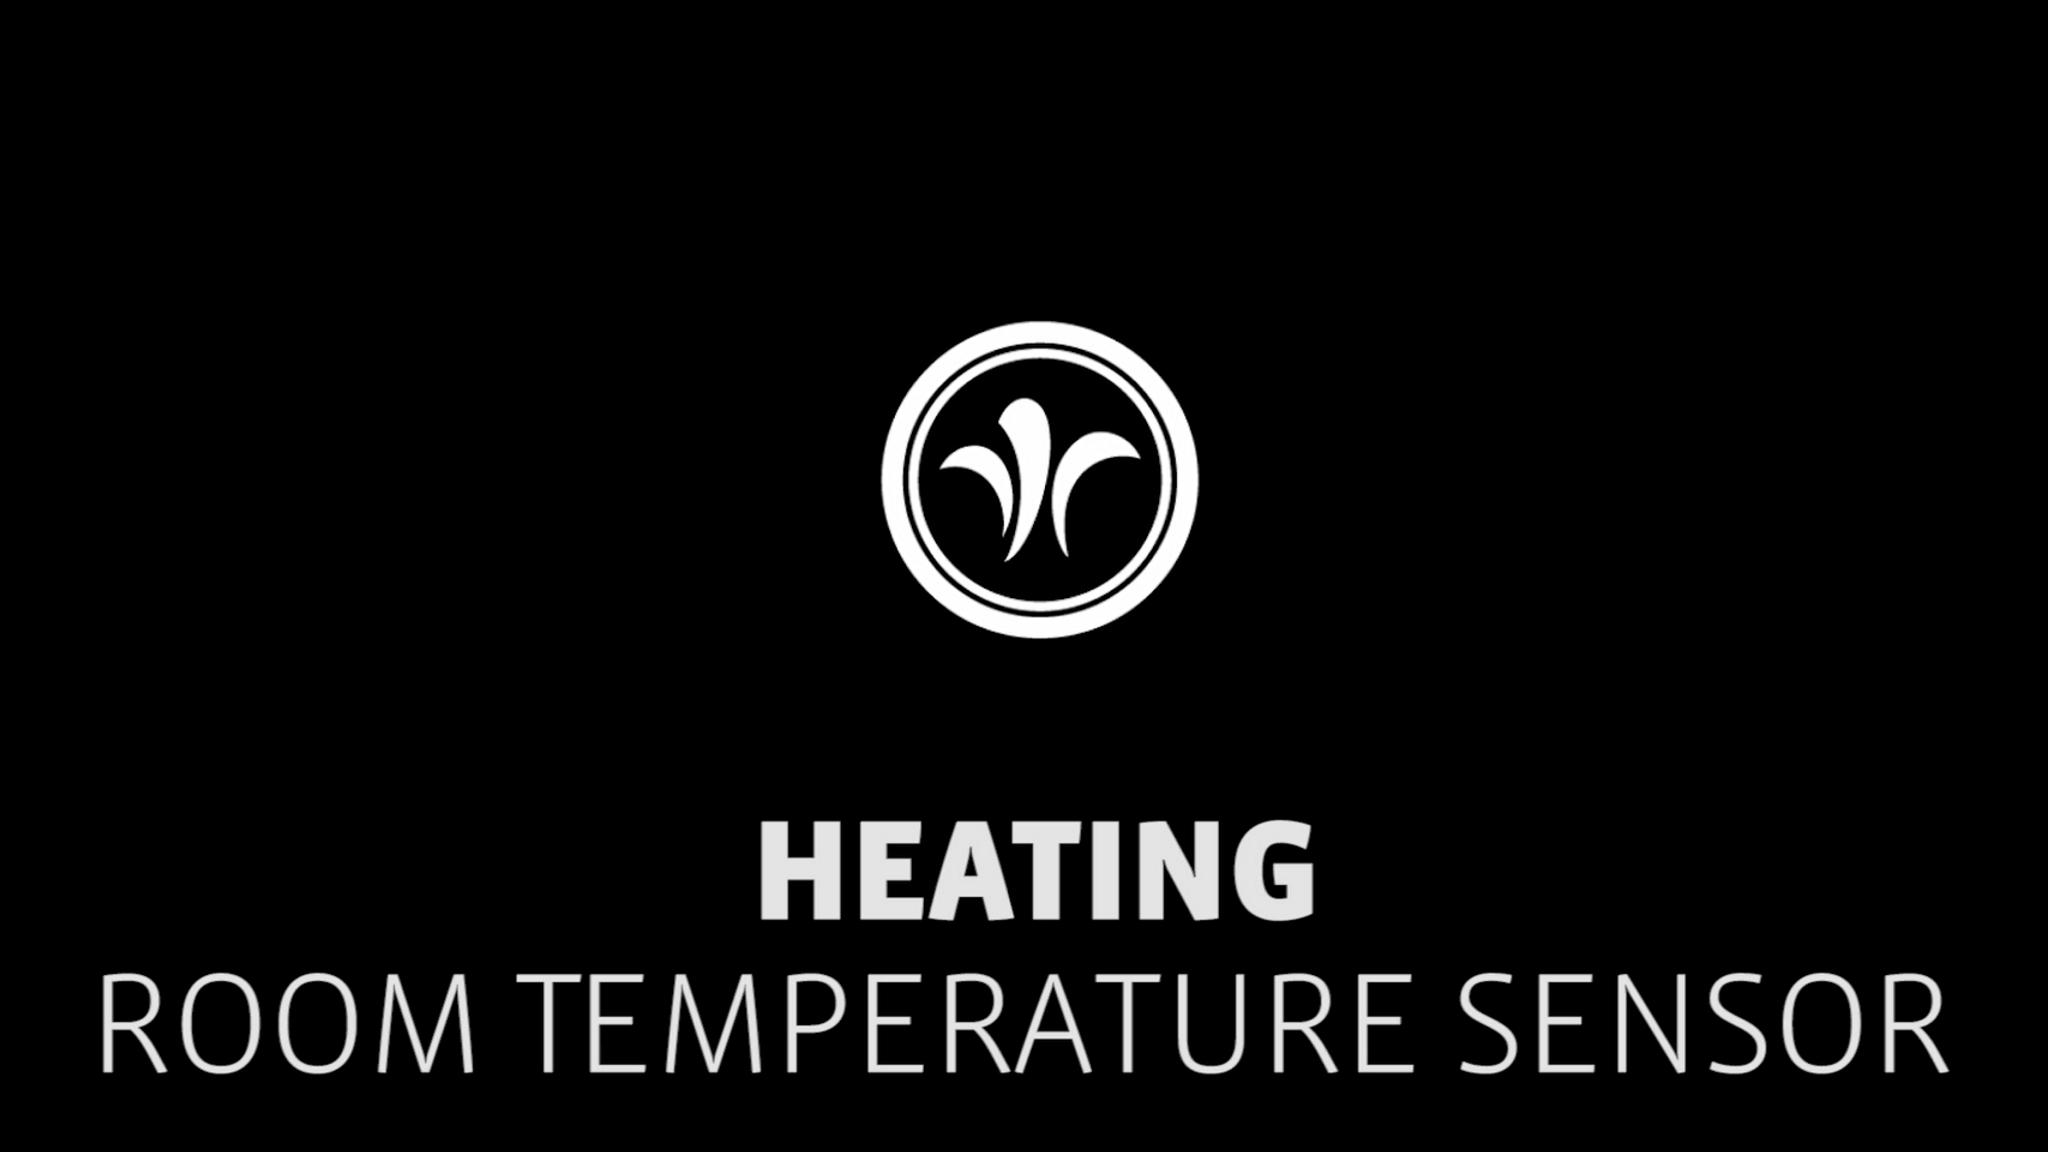 motorhome room temperature sensor // niesmannbischoff - camper (model ARTO) // 2019 // H1